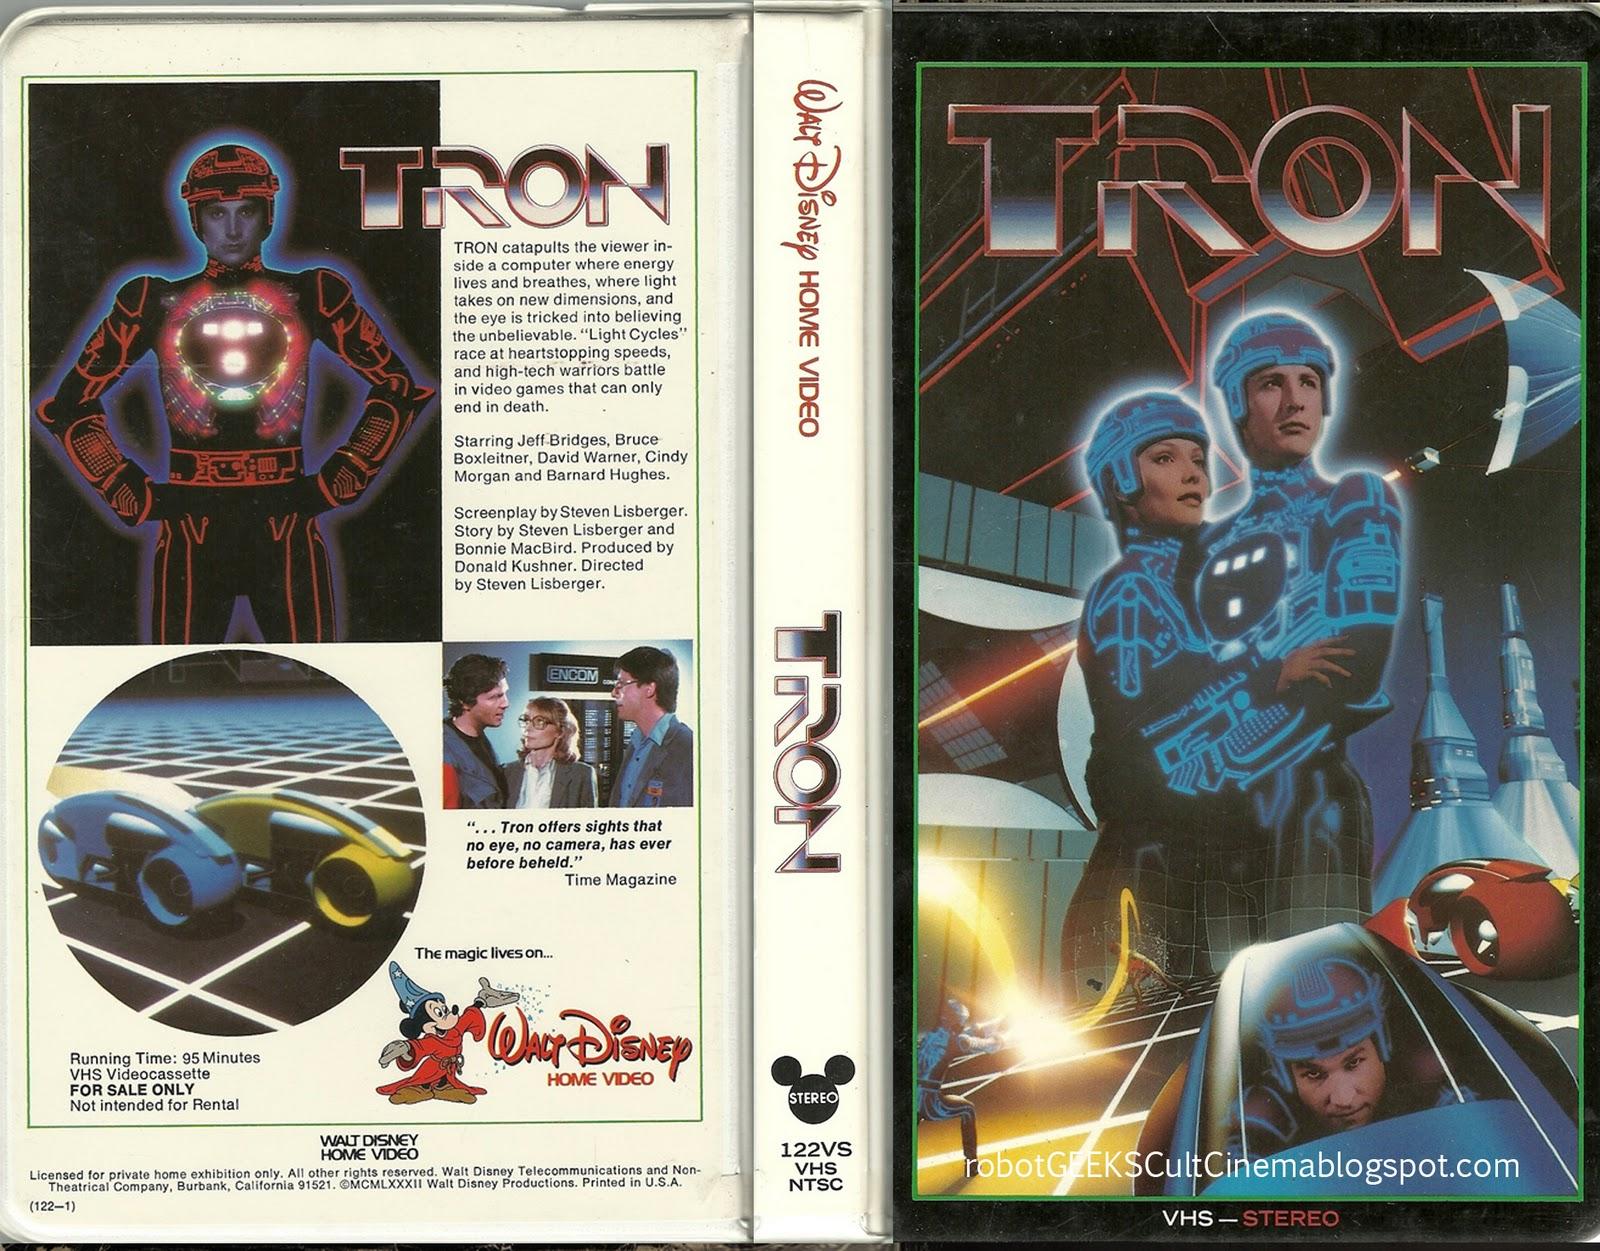 Tron original Disney U.S. VHS clamshell release